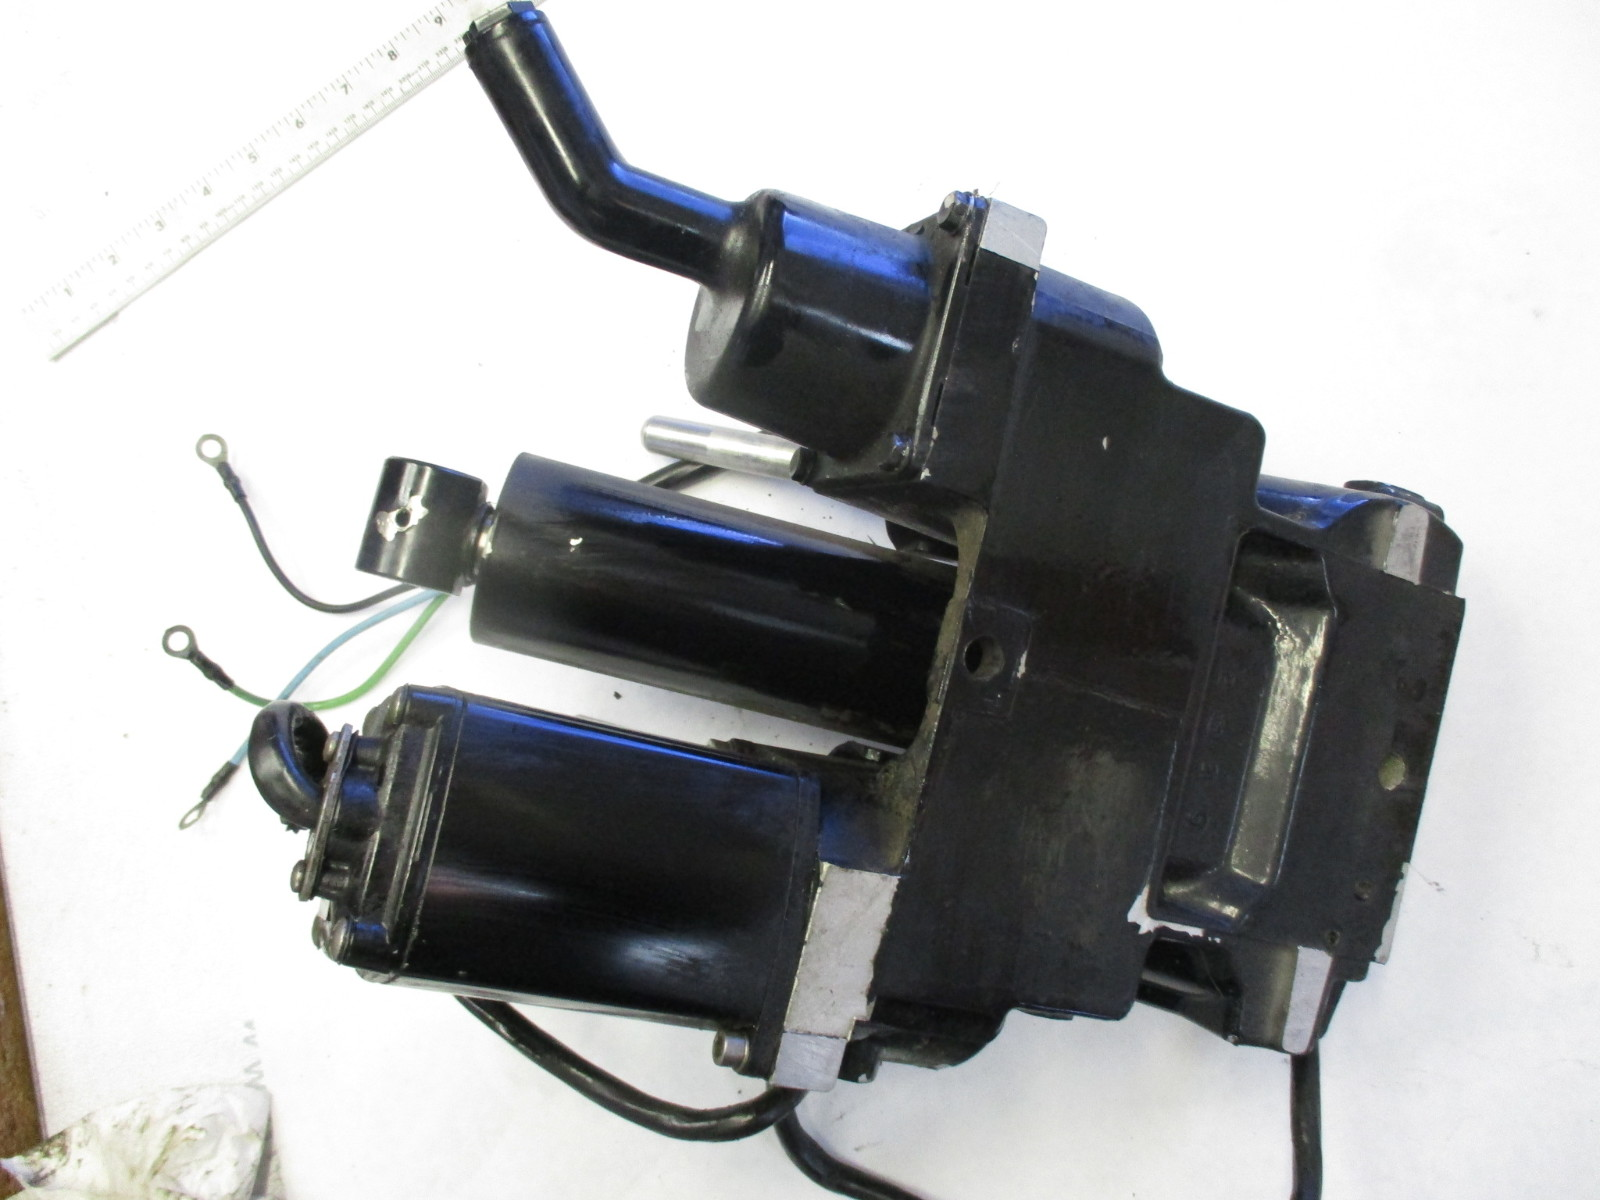 Mercury And Us Mariner Power Trim Motors And Assemblies Mastertech